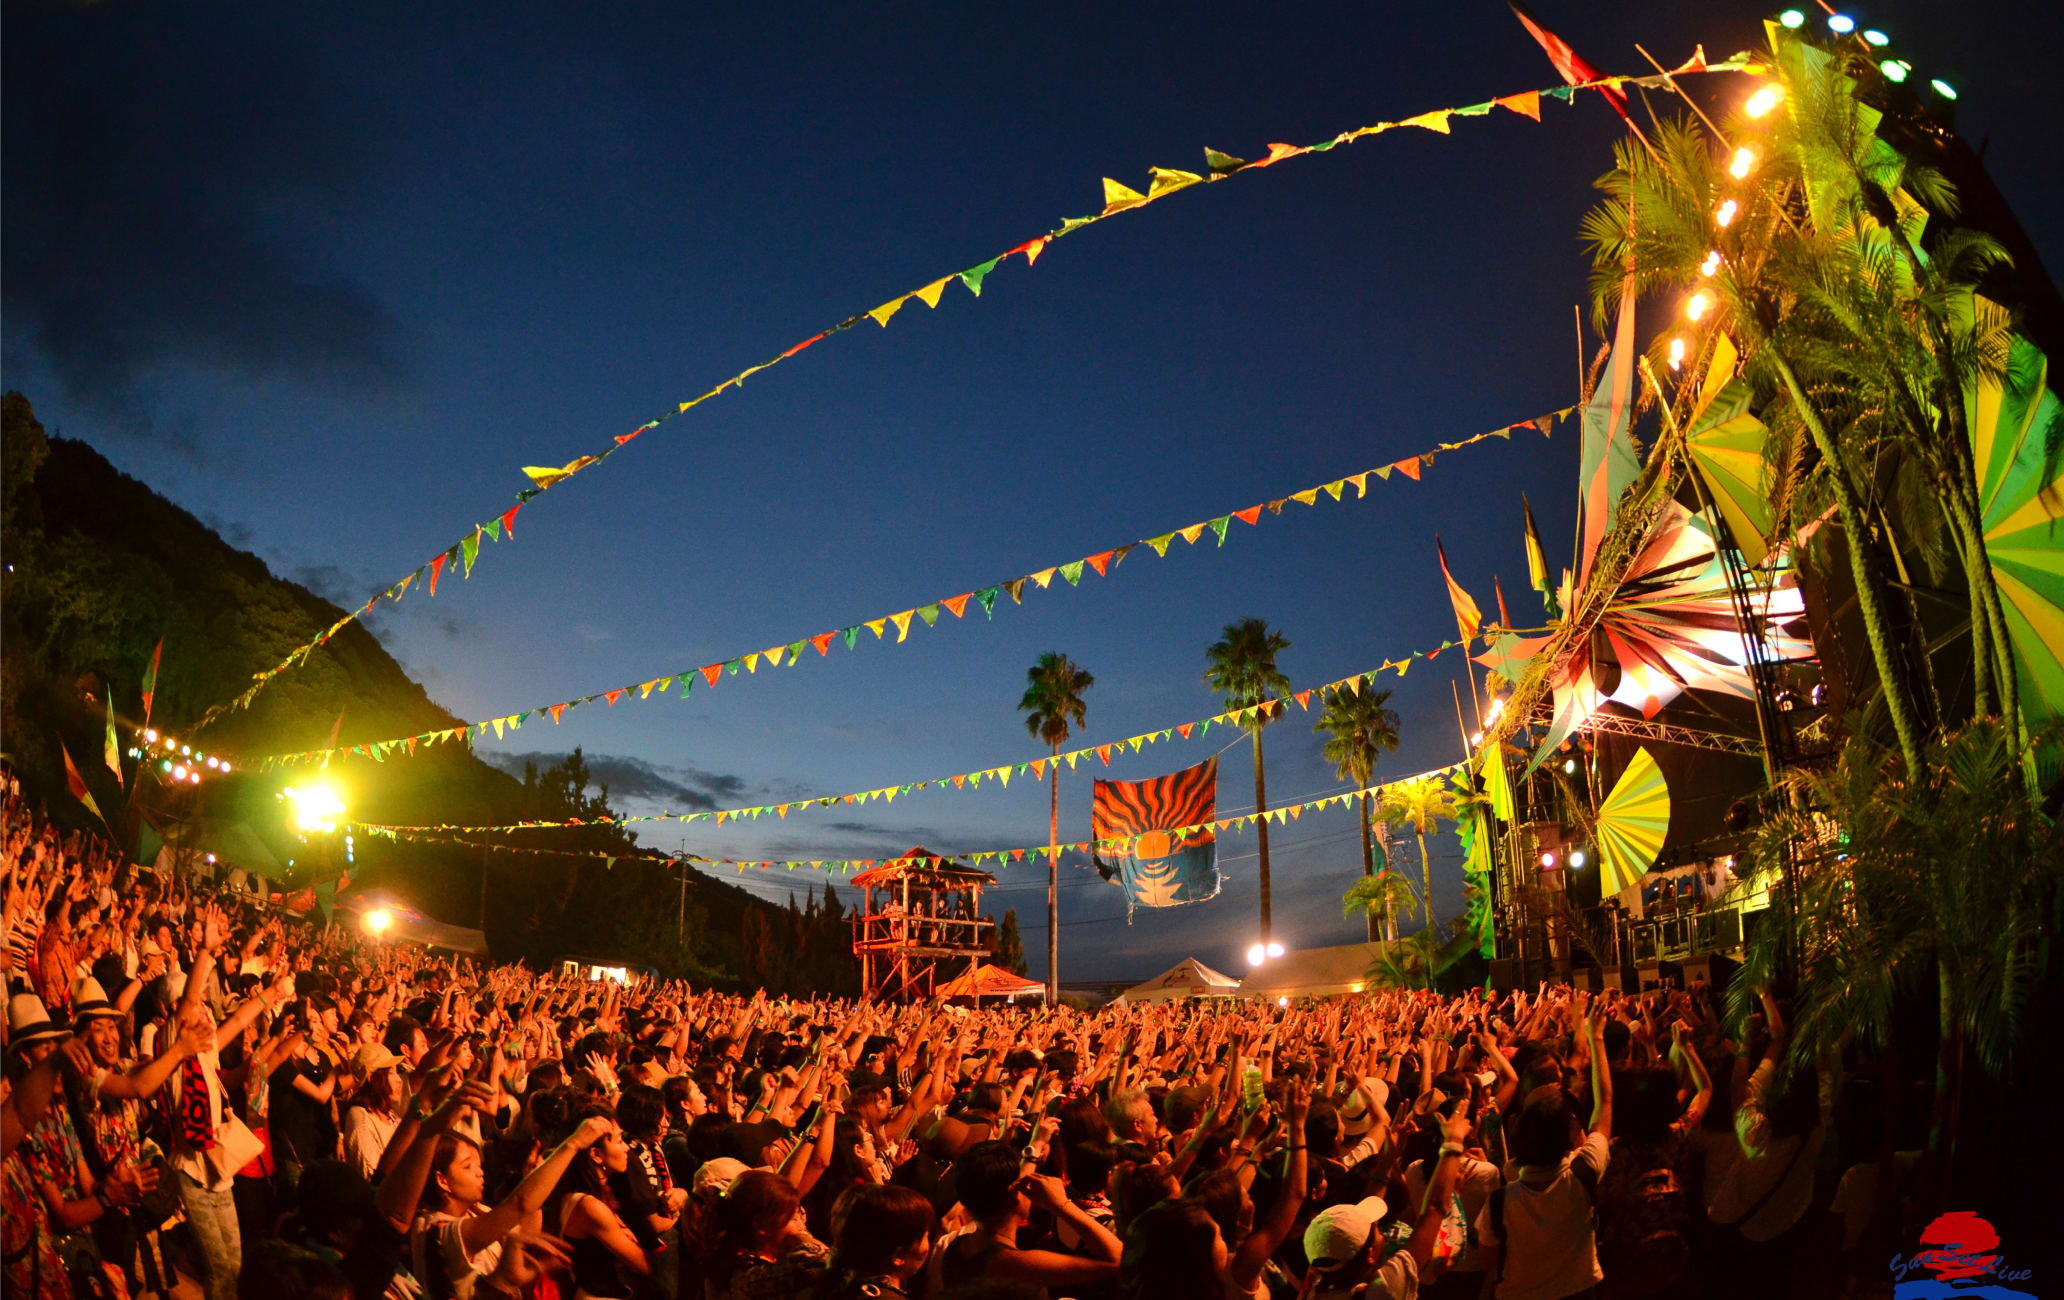 Sunset Live Music Festiva